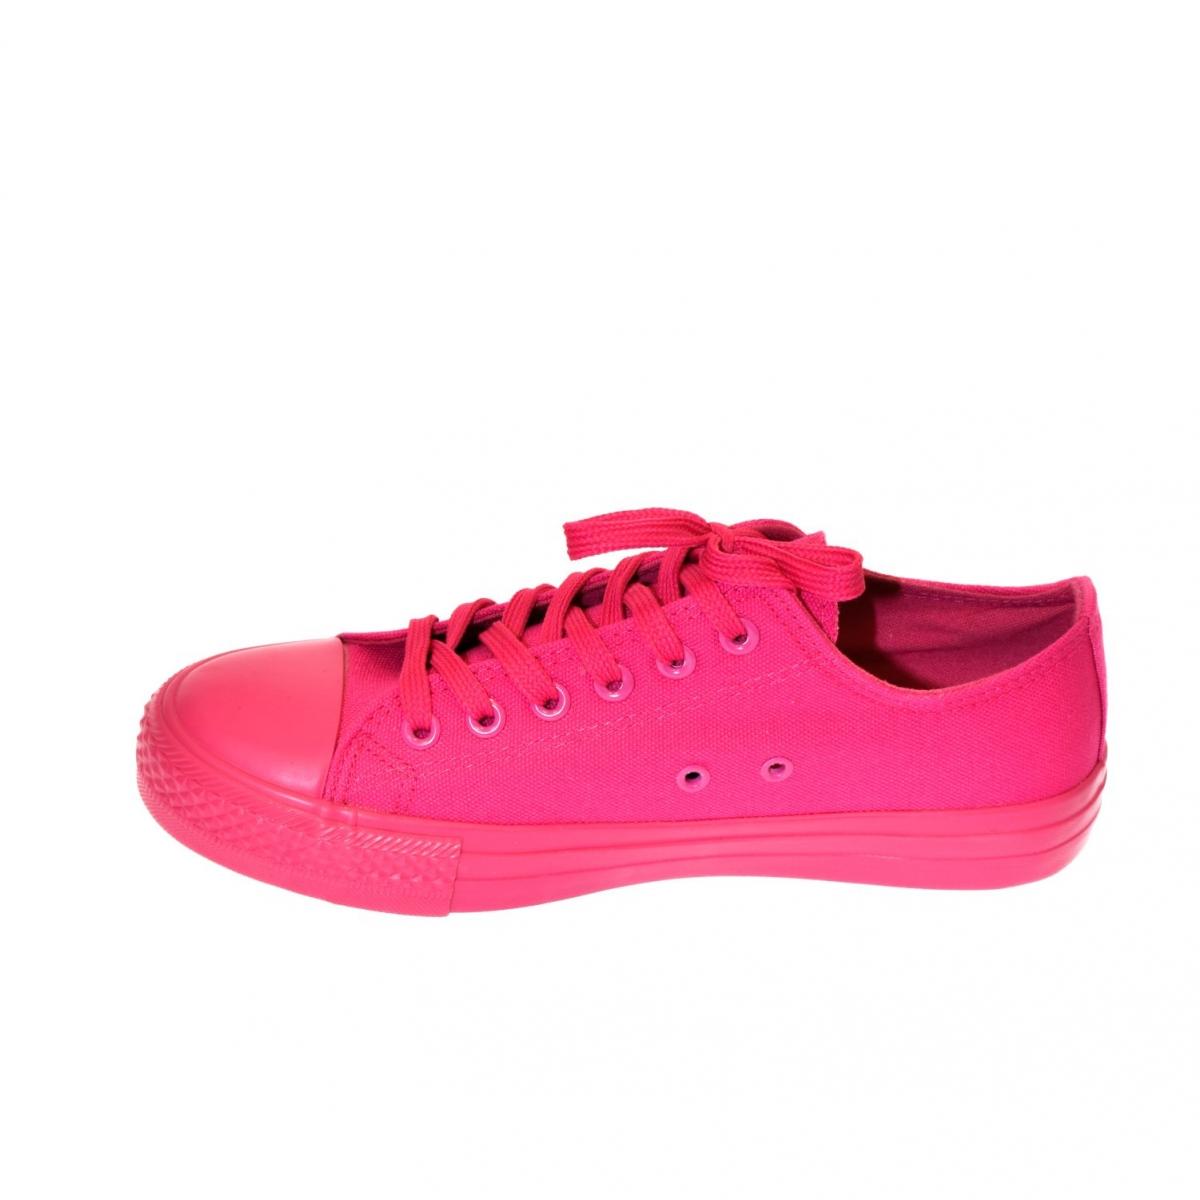 39a8b7fc826e Dámske ružové tenisky REINA - 3